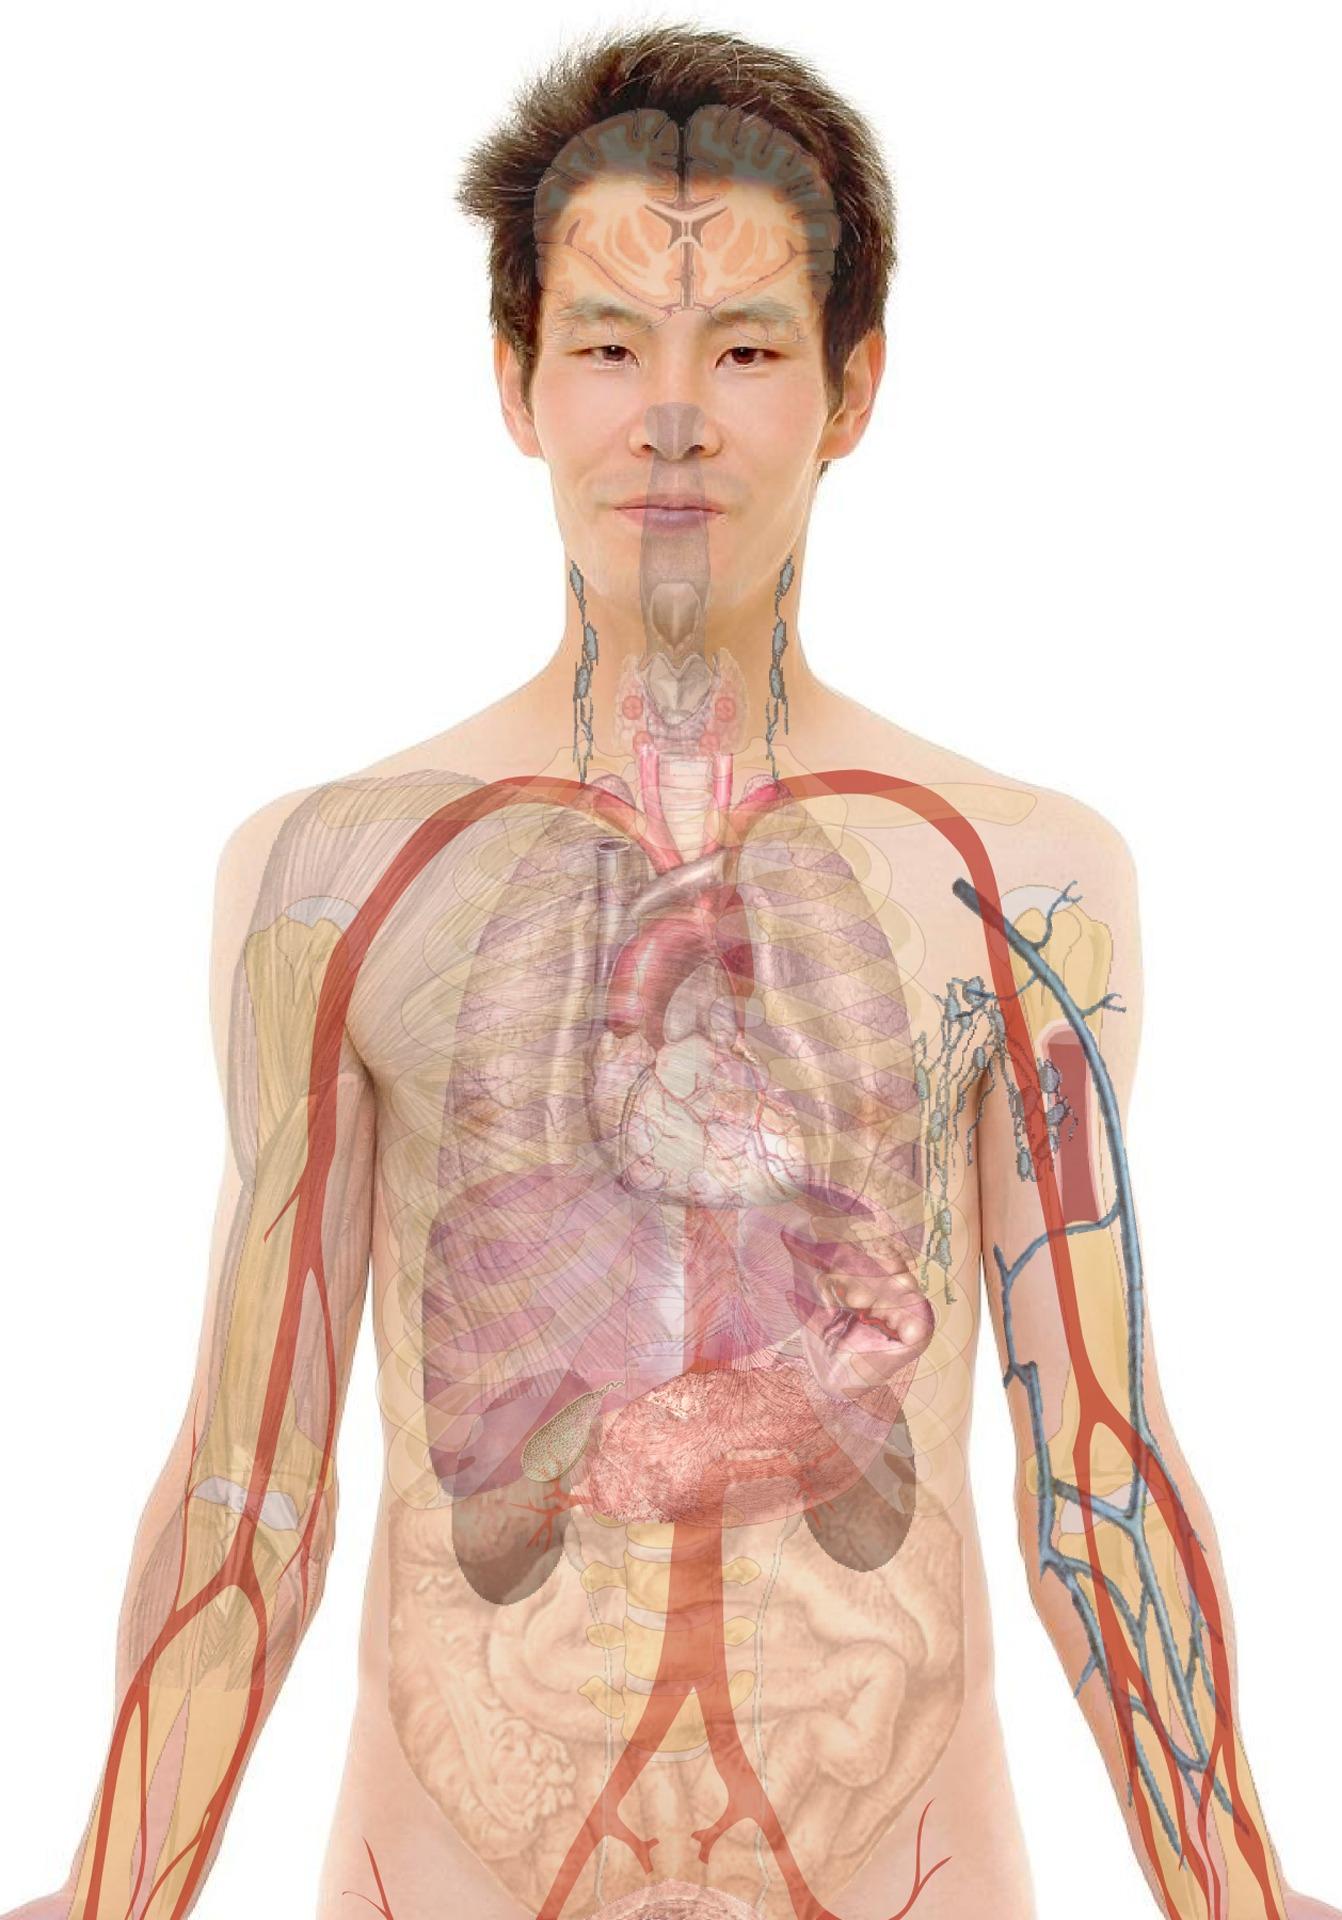 Parazita az emberben | Leggyakoribbak, tüneteik, kiűzésük